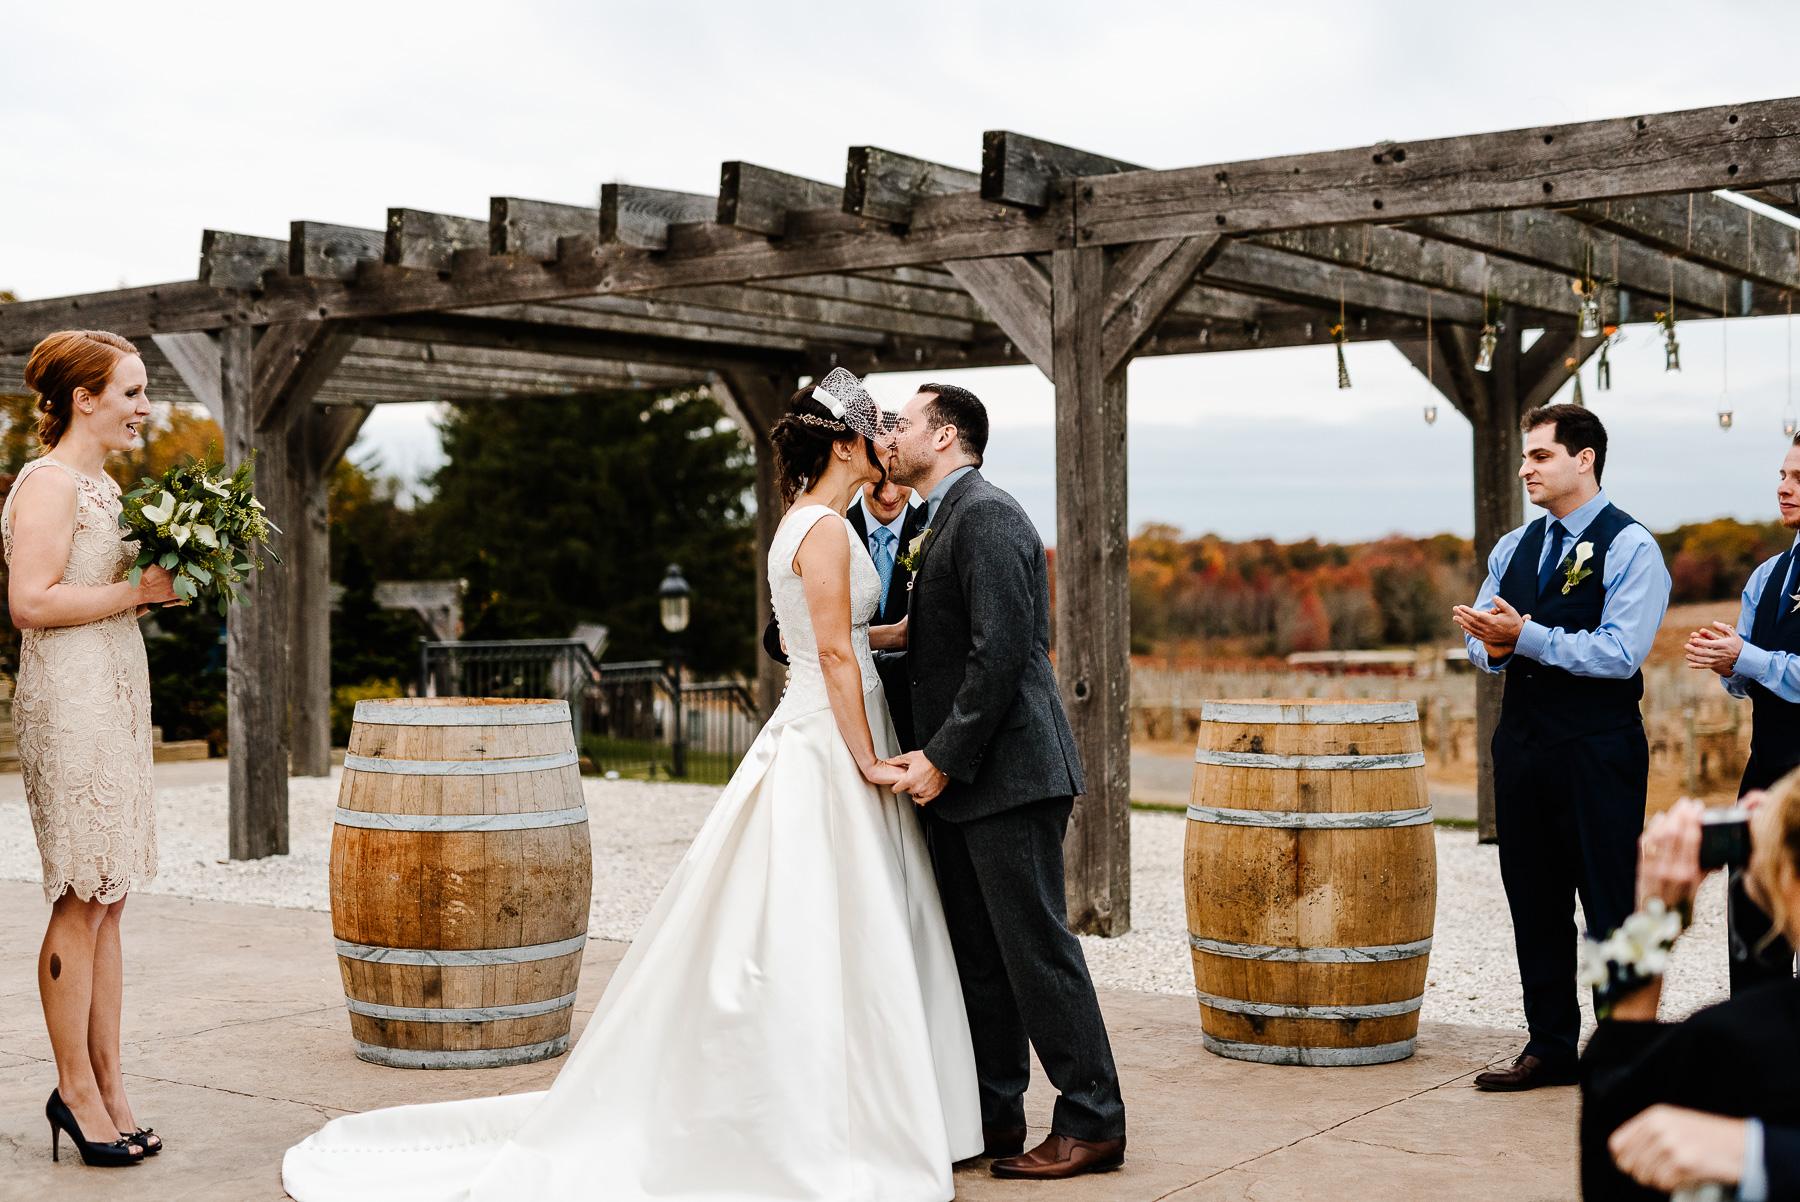 87-Laurita Winery Wedding New Jersey Wedding Photographer Laurita Winery Weddings Longbrook Photography.jpg